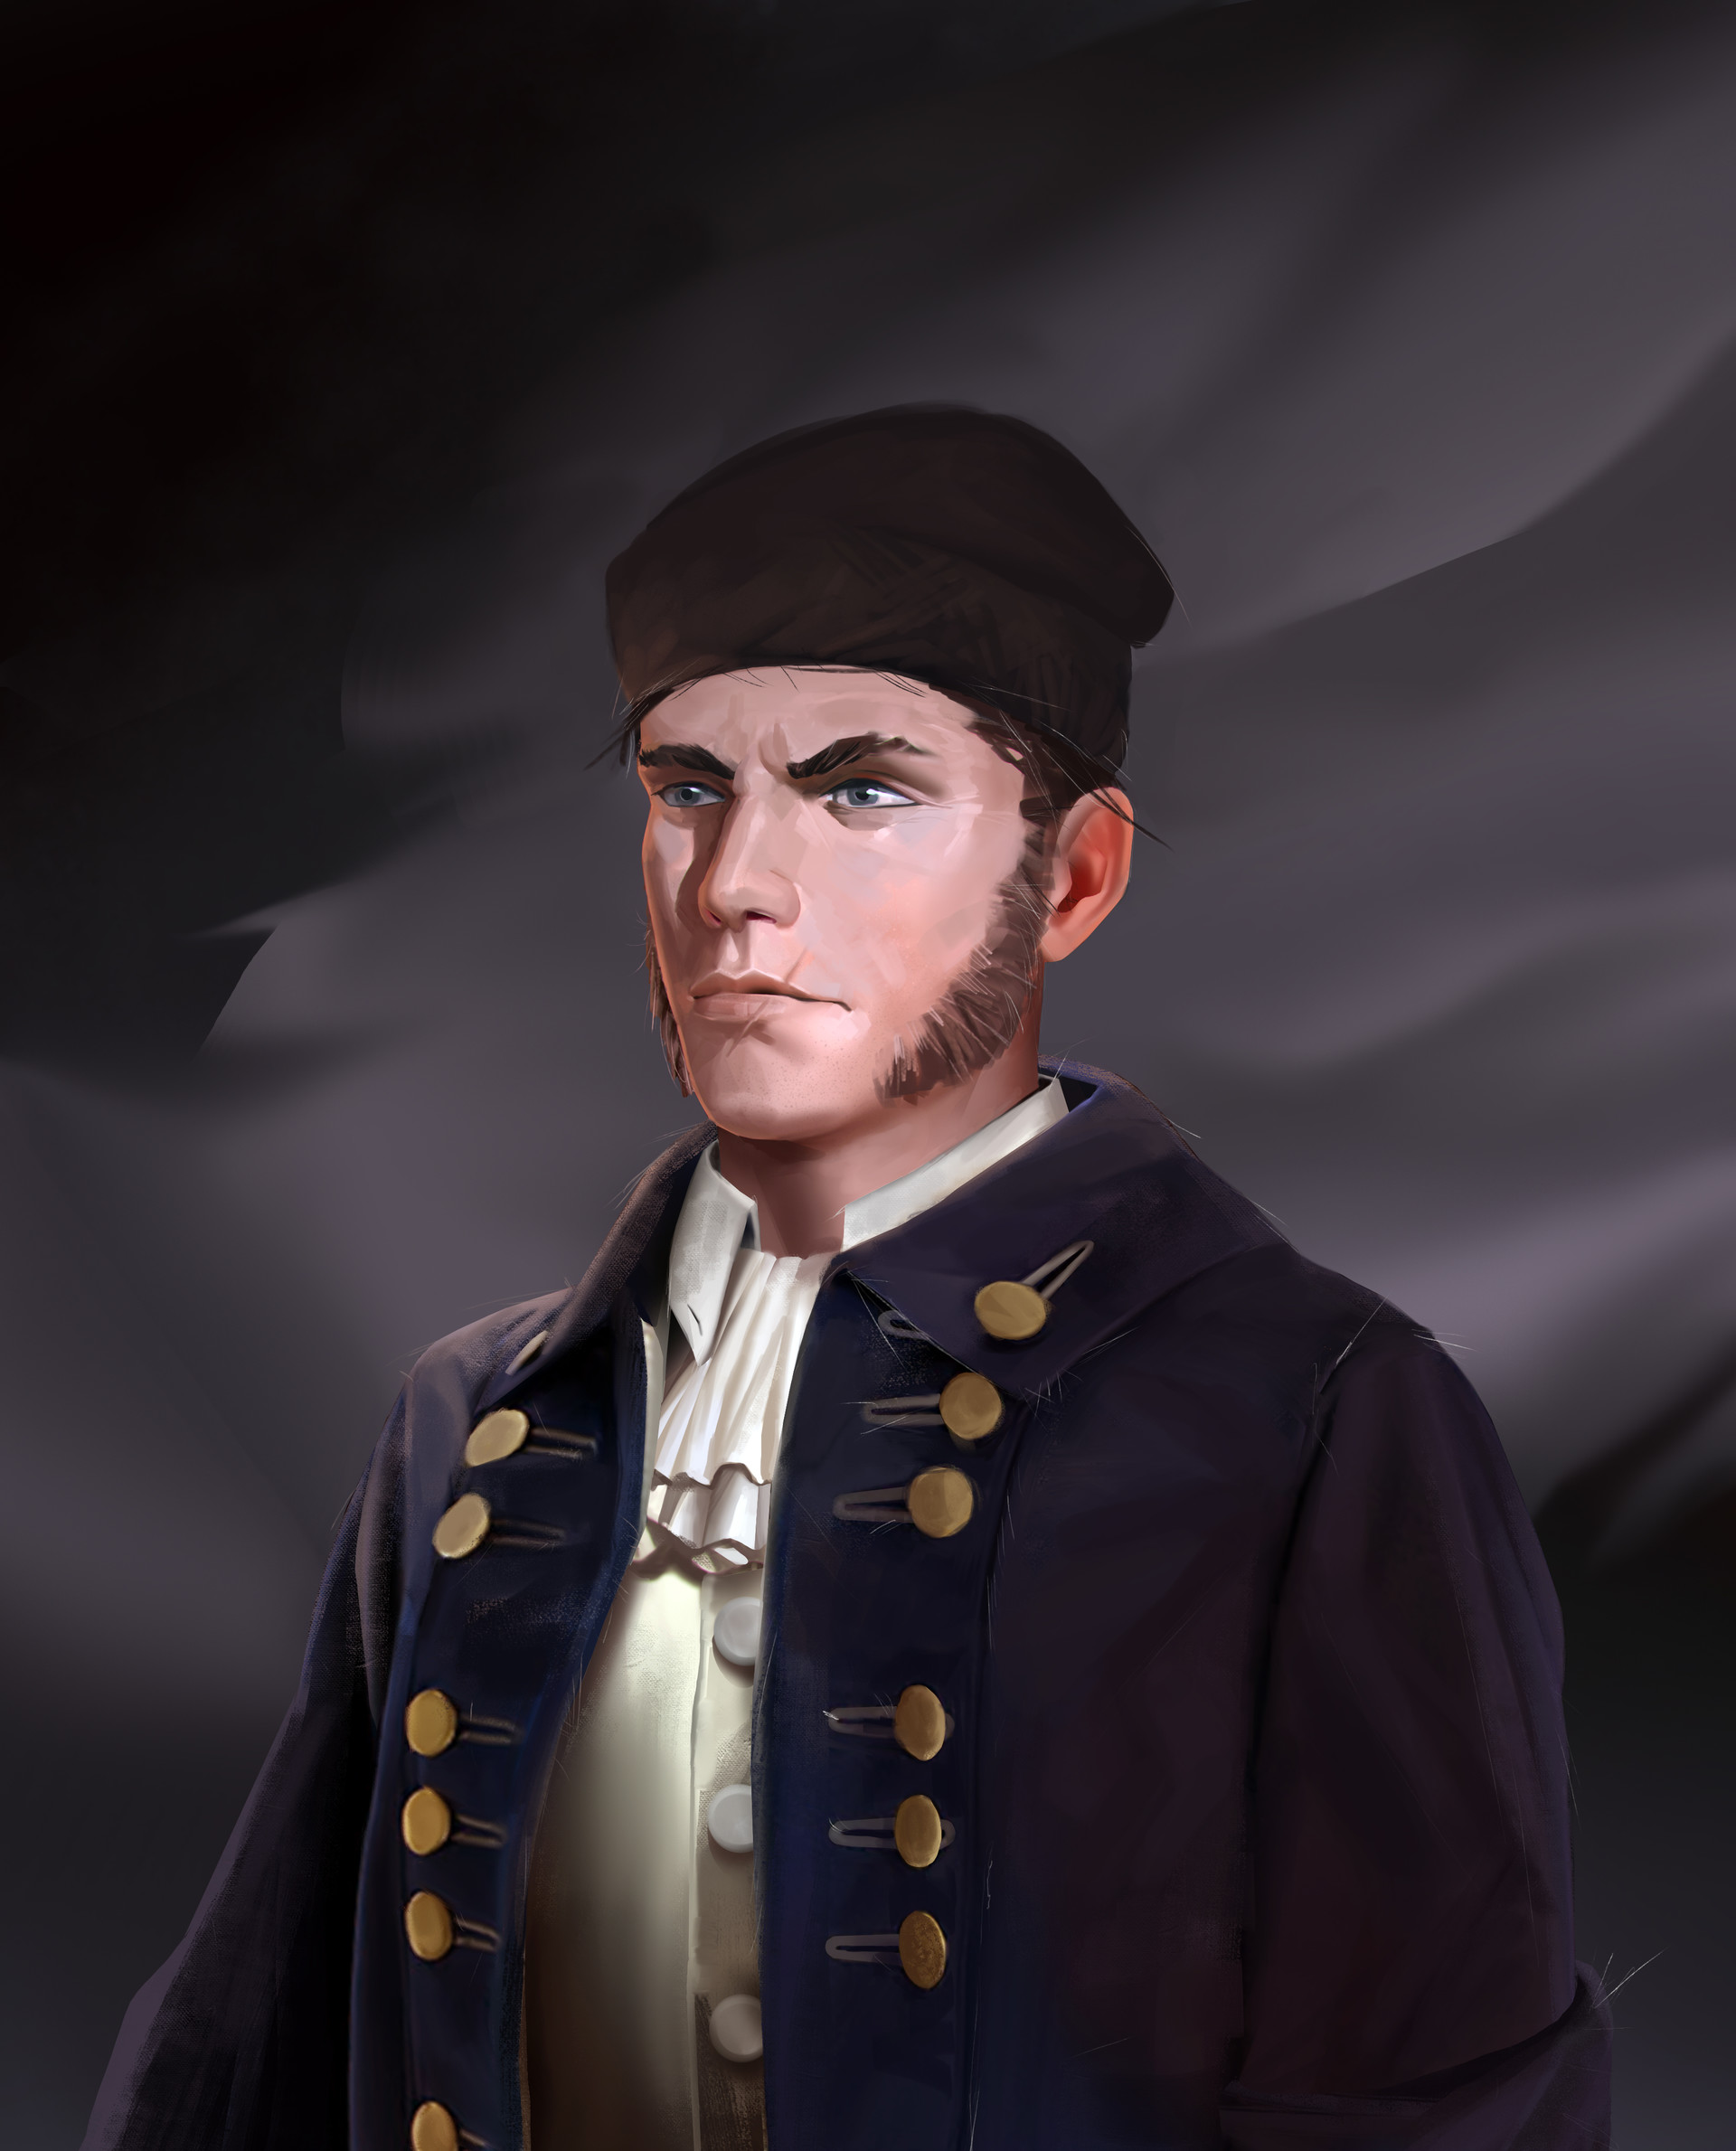 Lucaciu roland sailor captain